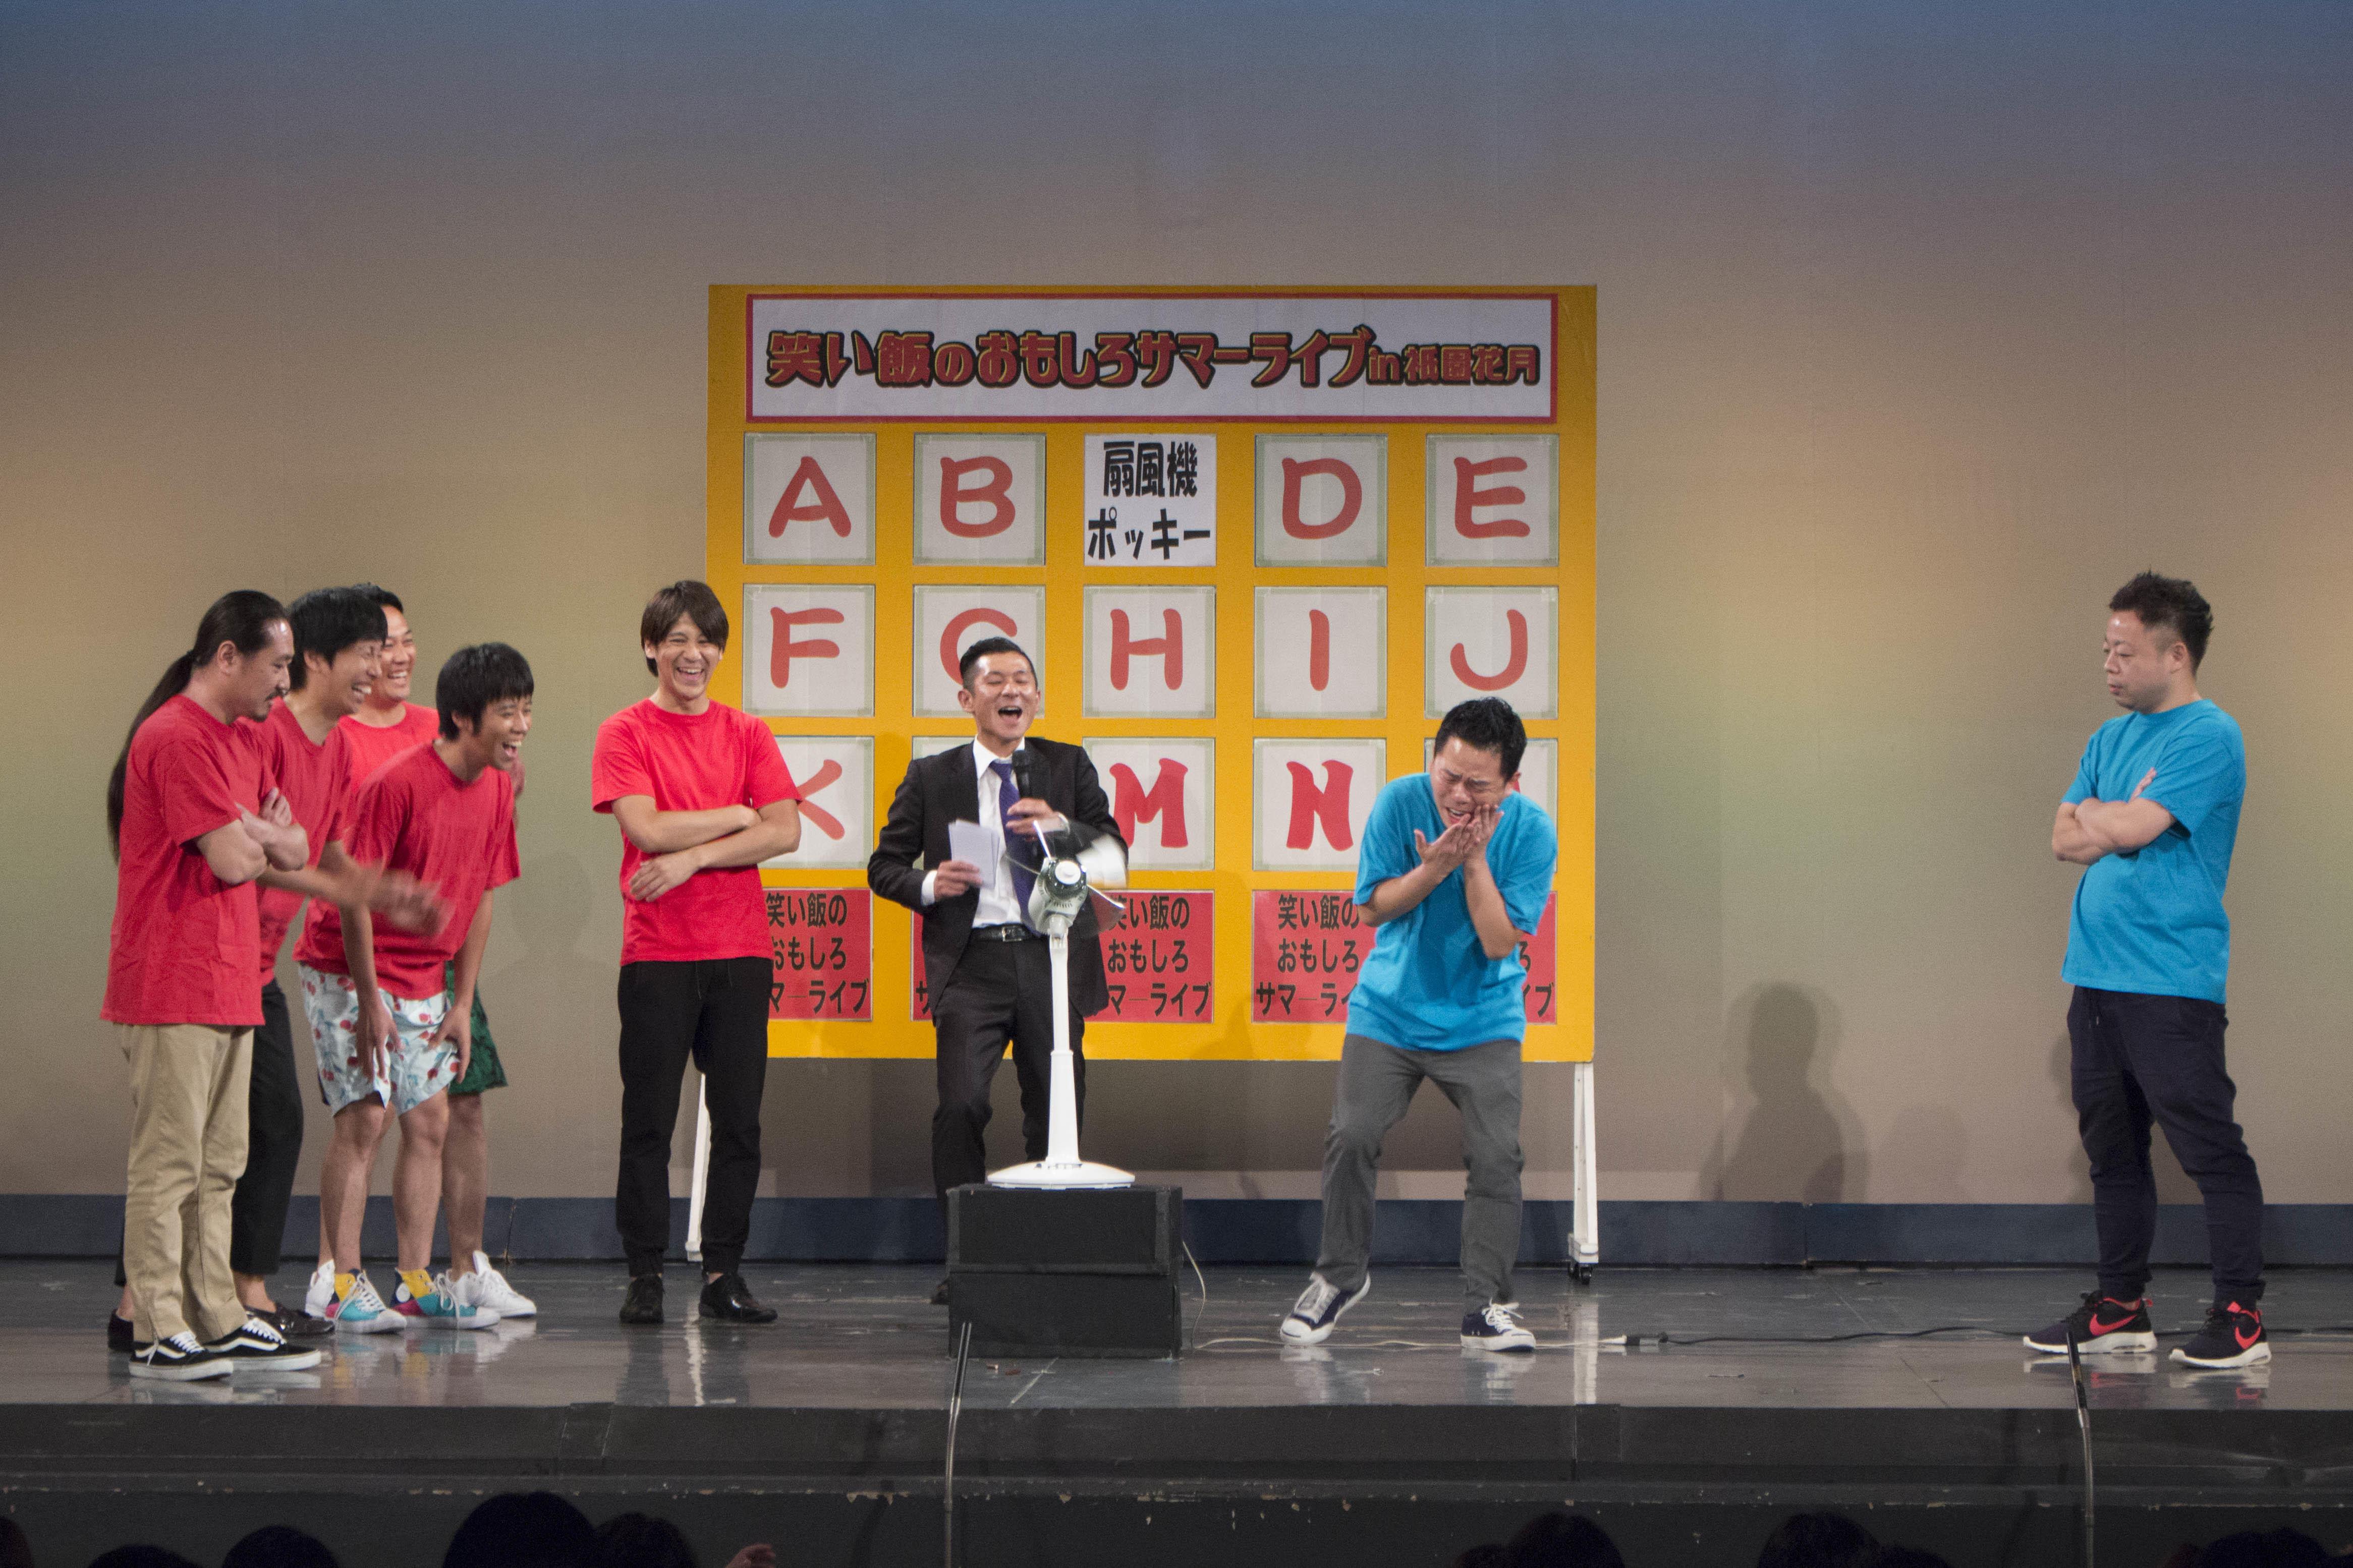 http://news.yoshimoto.co.jp/20180715061950-f808a5488952d9b3a25726eb6484be45721bac63.jpg